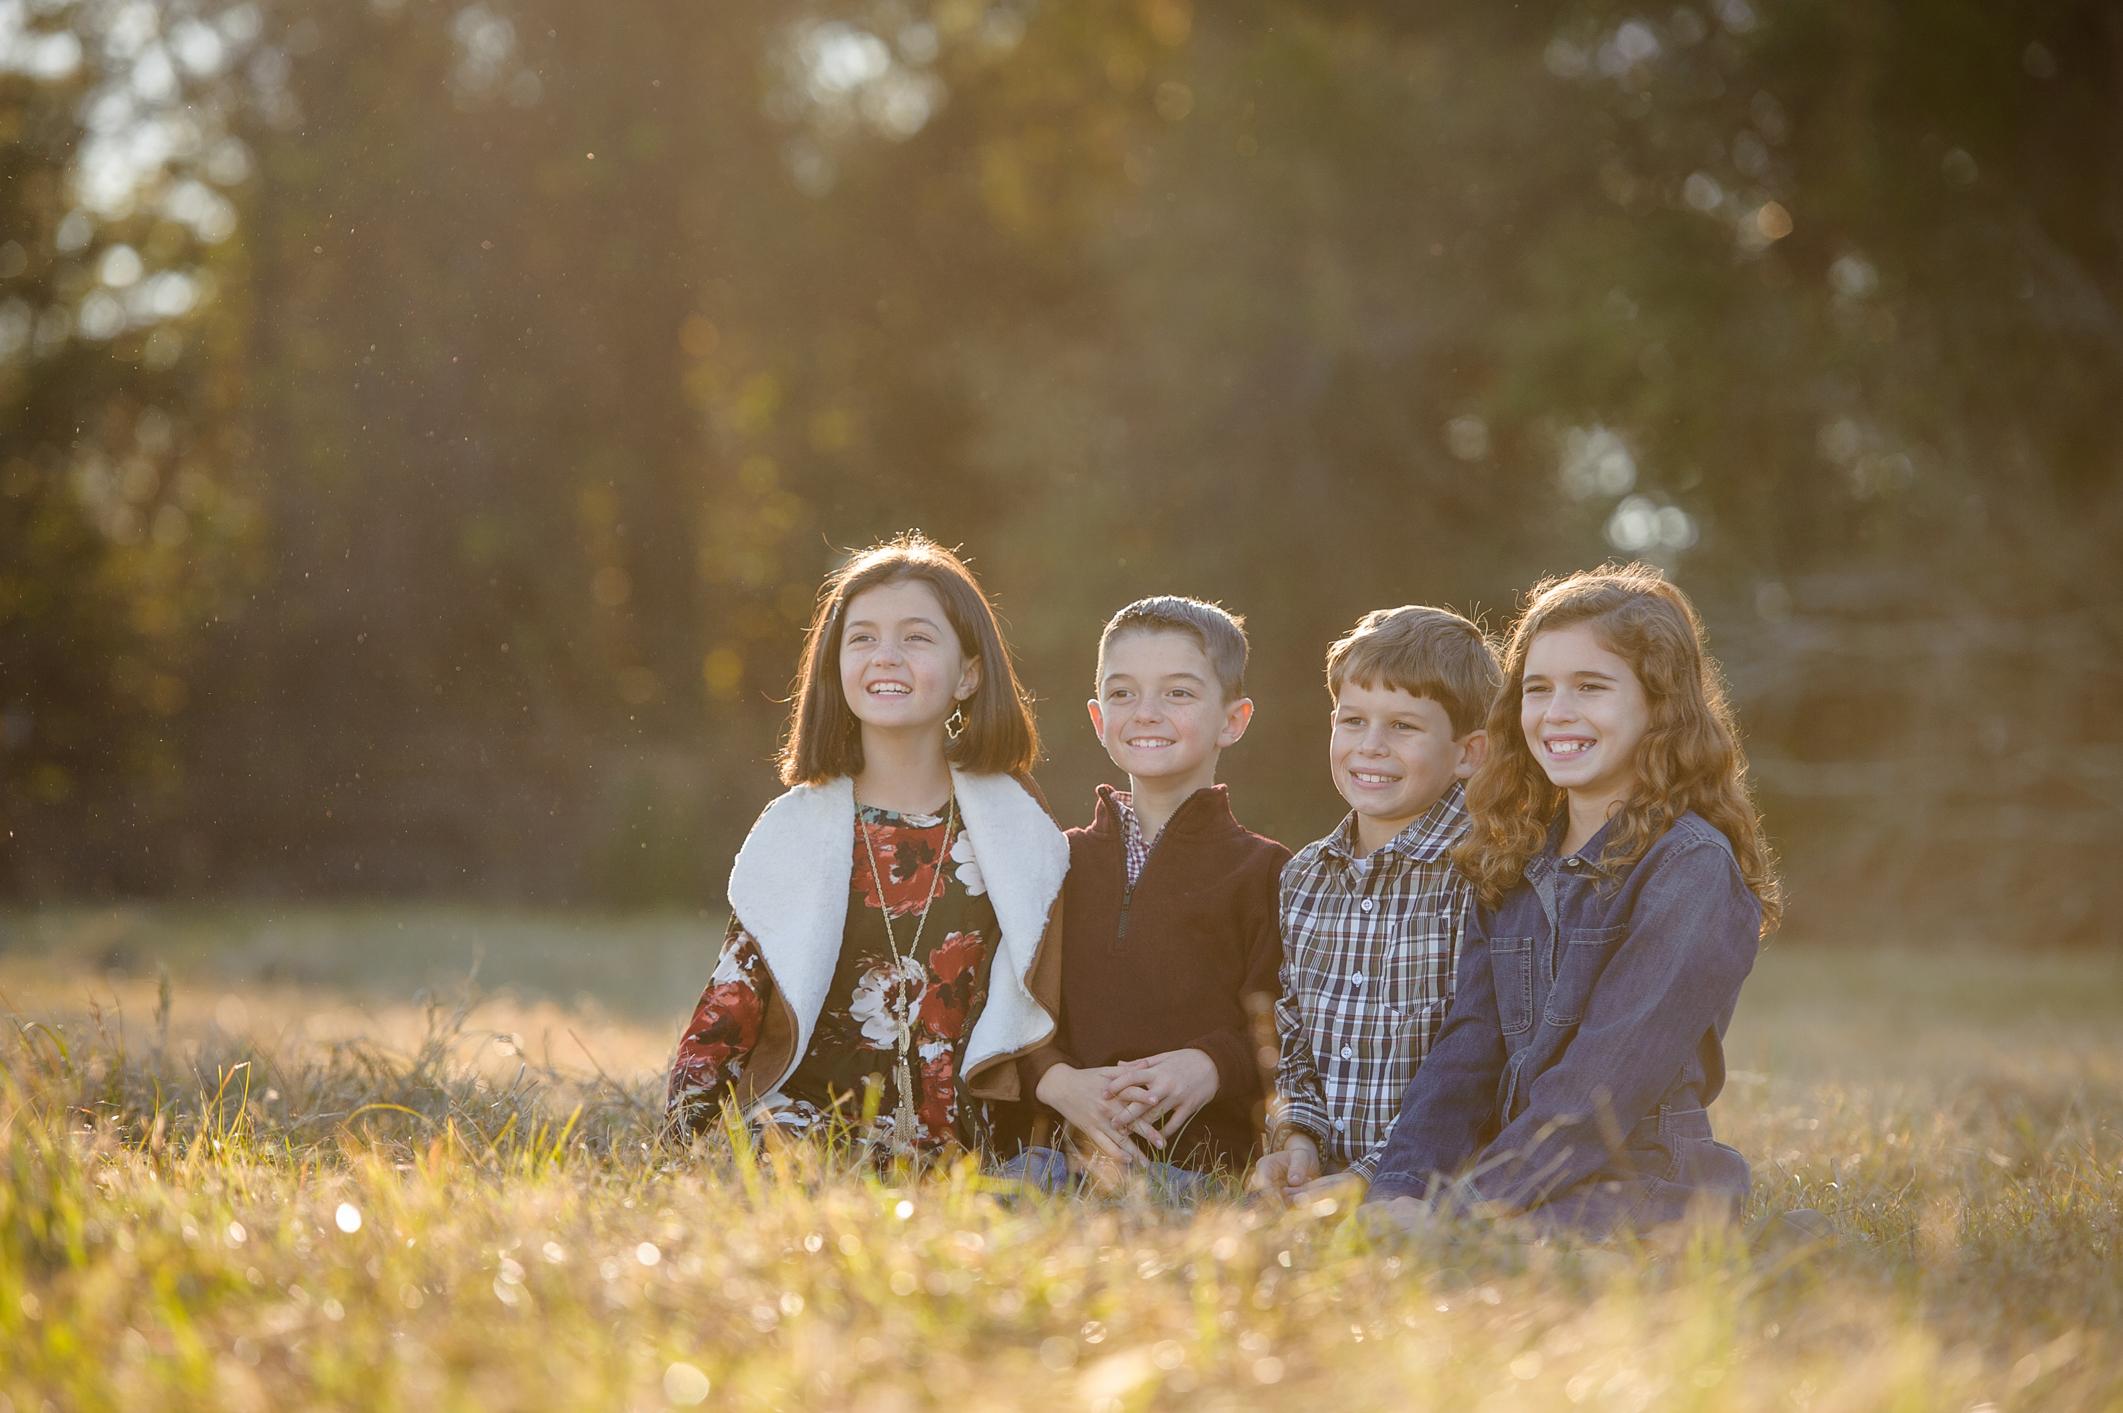 Two Of Us Wedding Photography: The Walton Family : Family Photographer